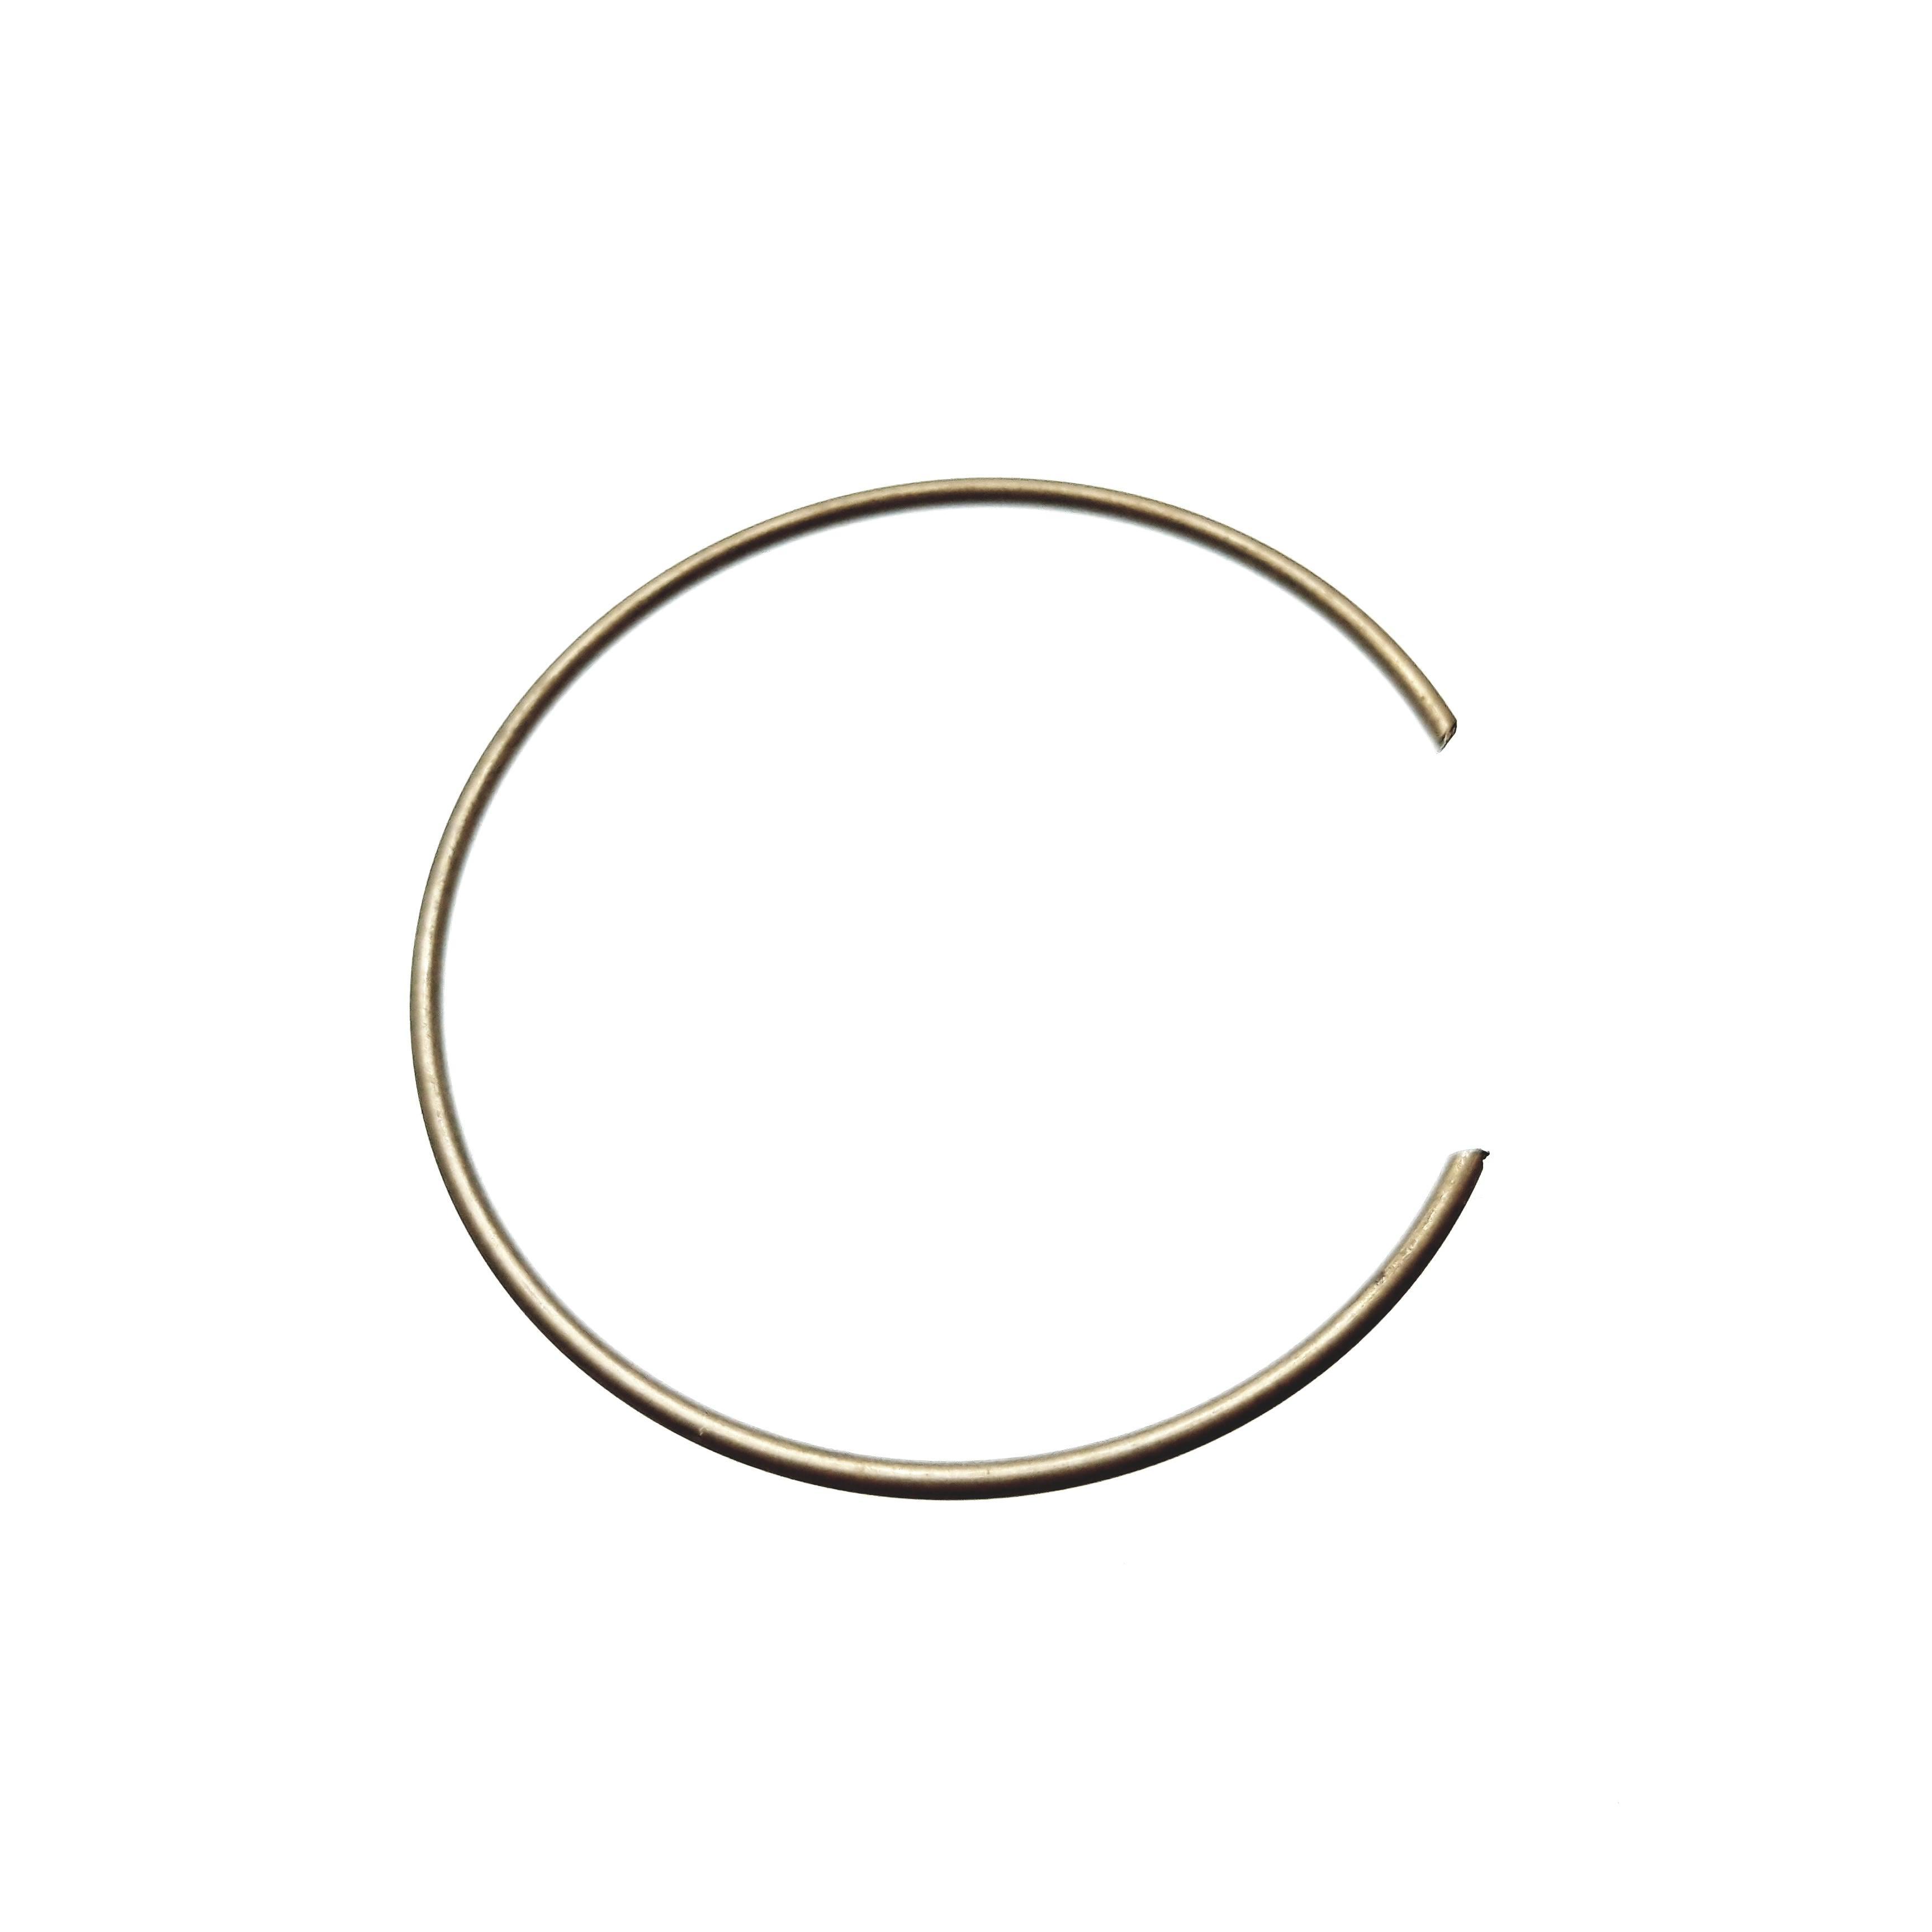 Retaining Ring: Wire (0.062 CS X 1.850 ID) 17-7 SS